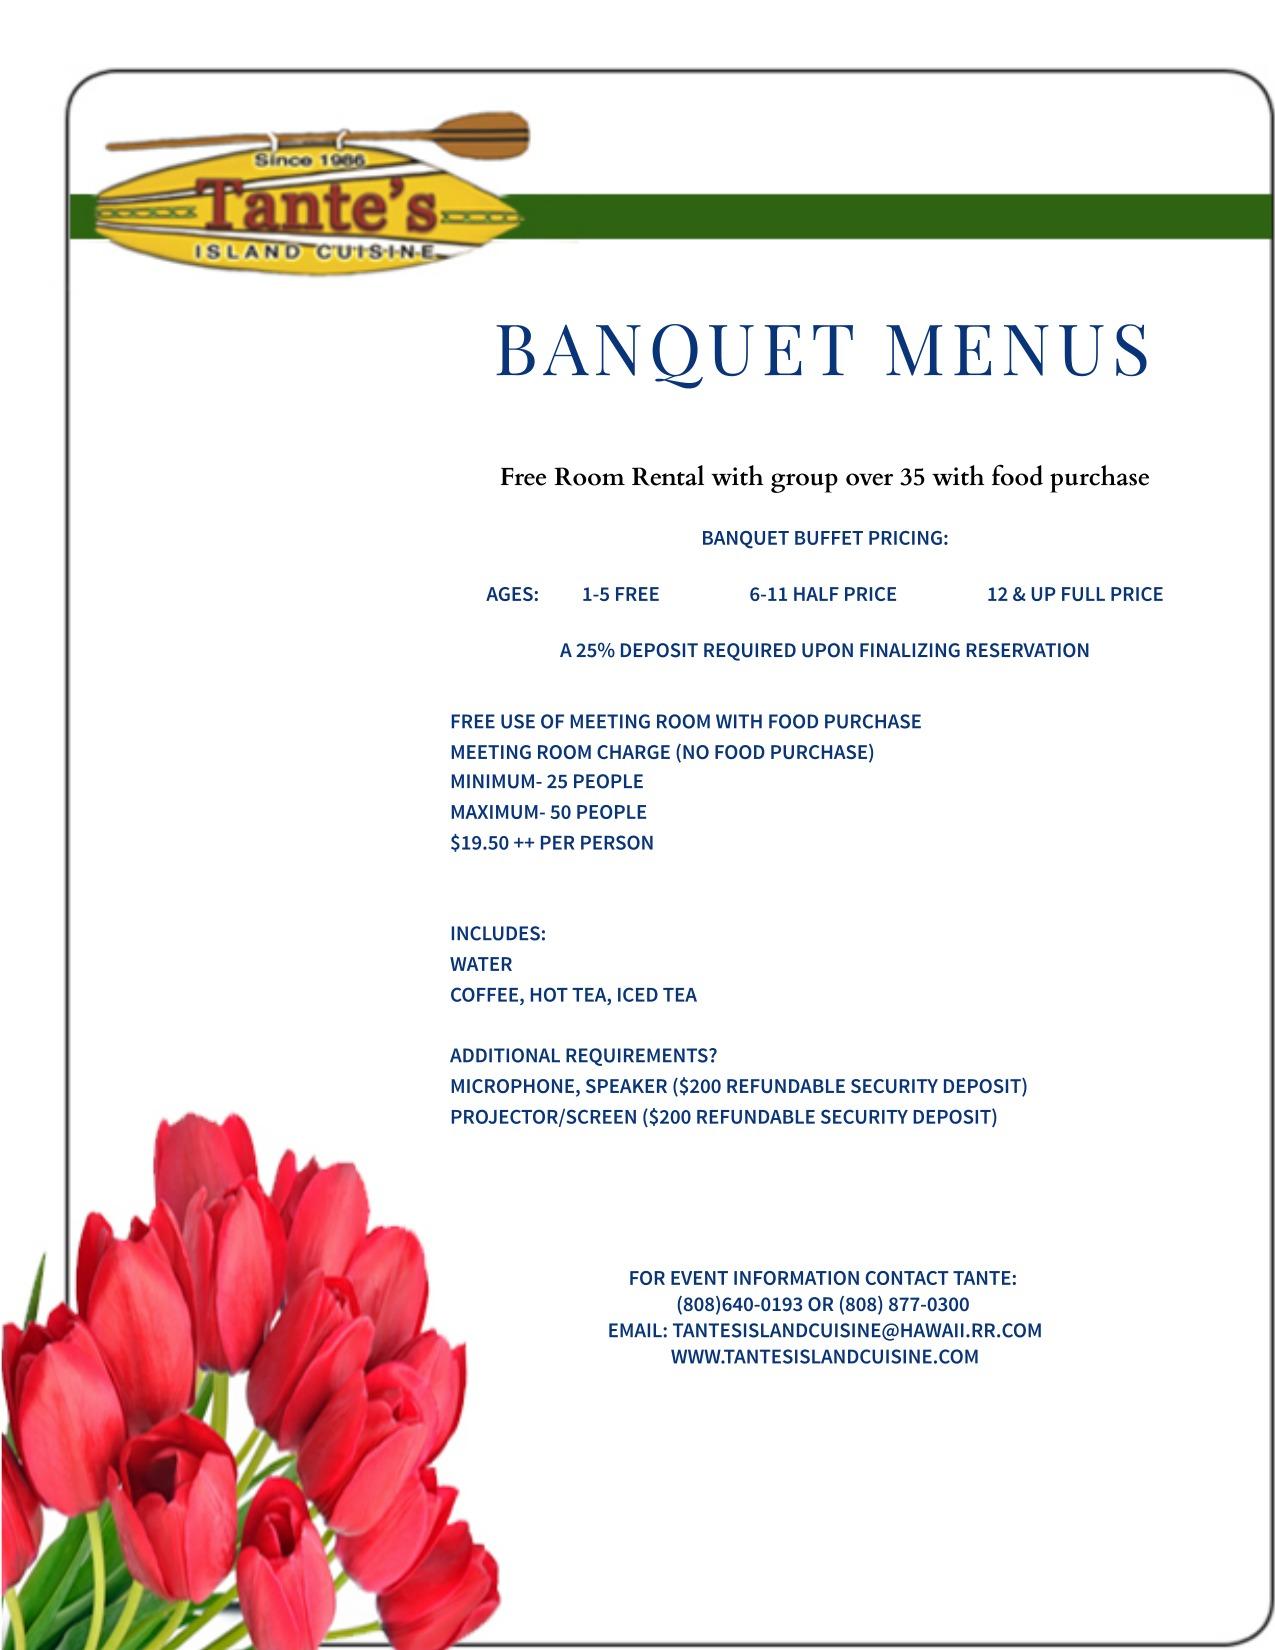 Banquet Menus for Tantes Island Cuisine 2017